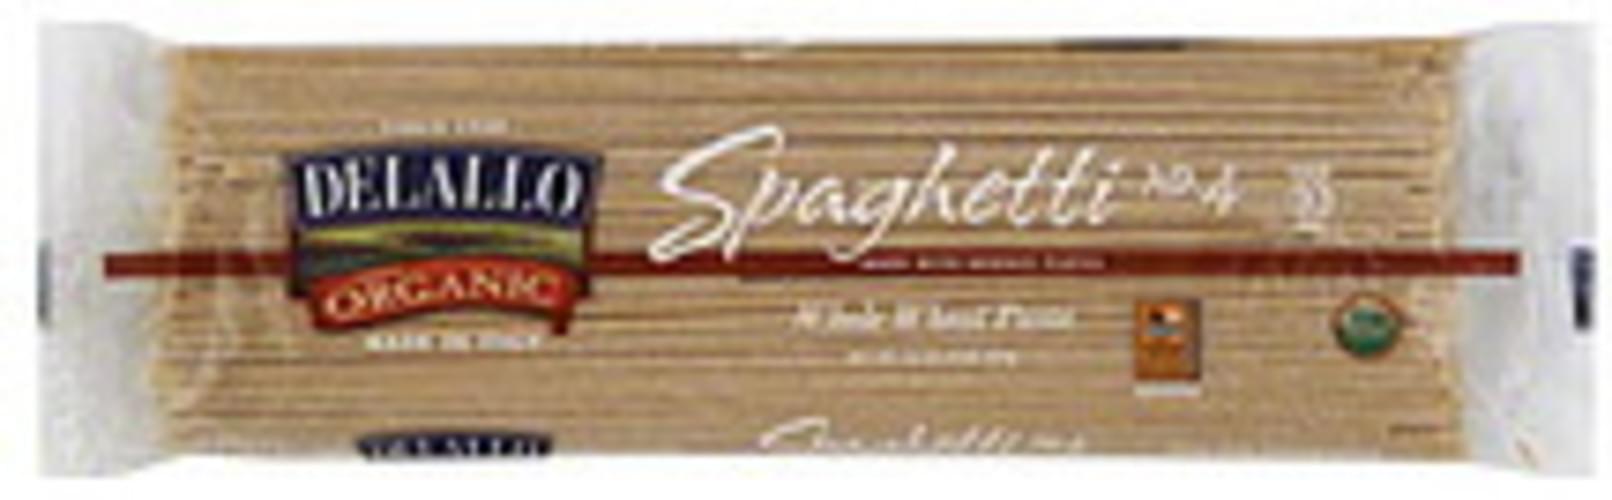 Delallo Spaghetti 16 Oz Pasta - 16 pkg